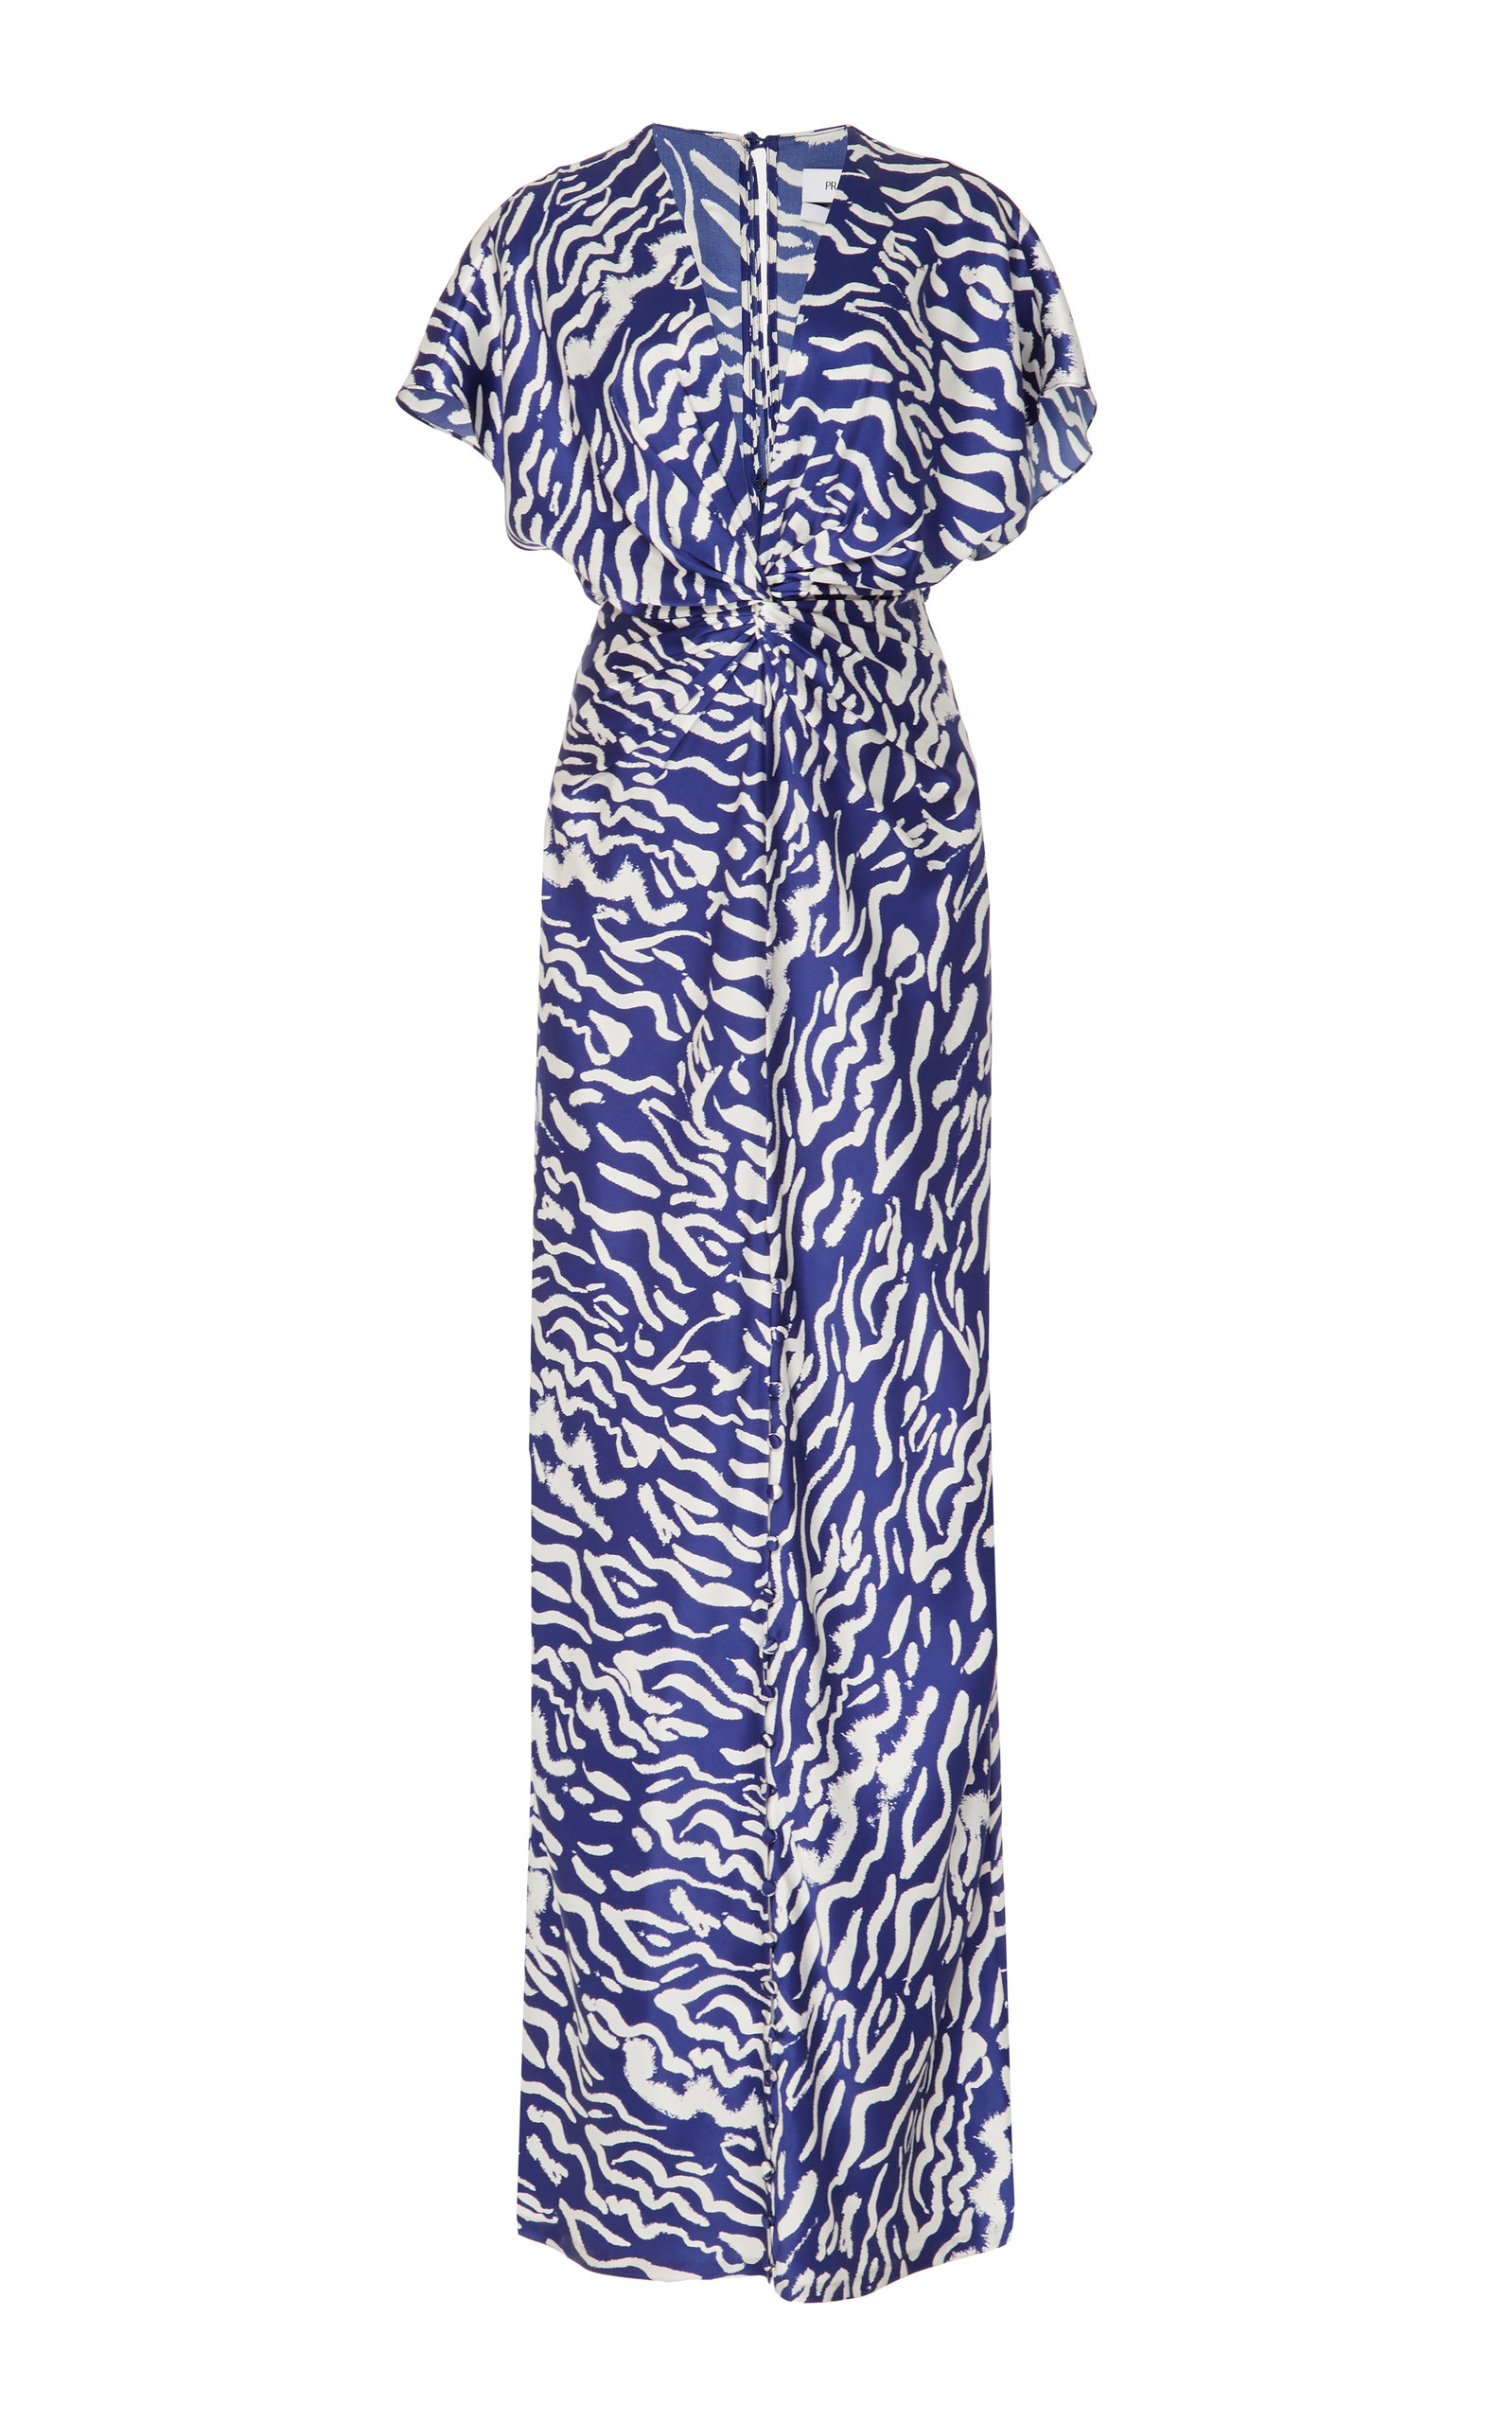 PRABAL GURUNG | Prabal Gurung Printed Twist Front Silk Dress | Goxip